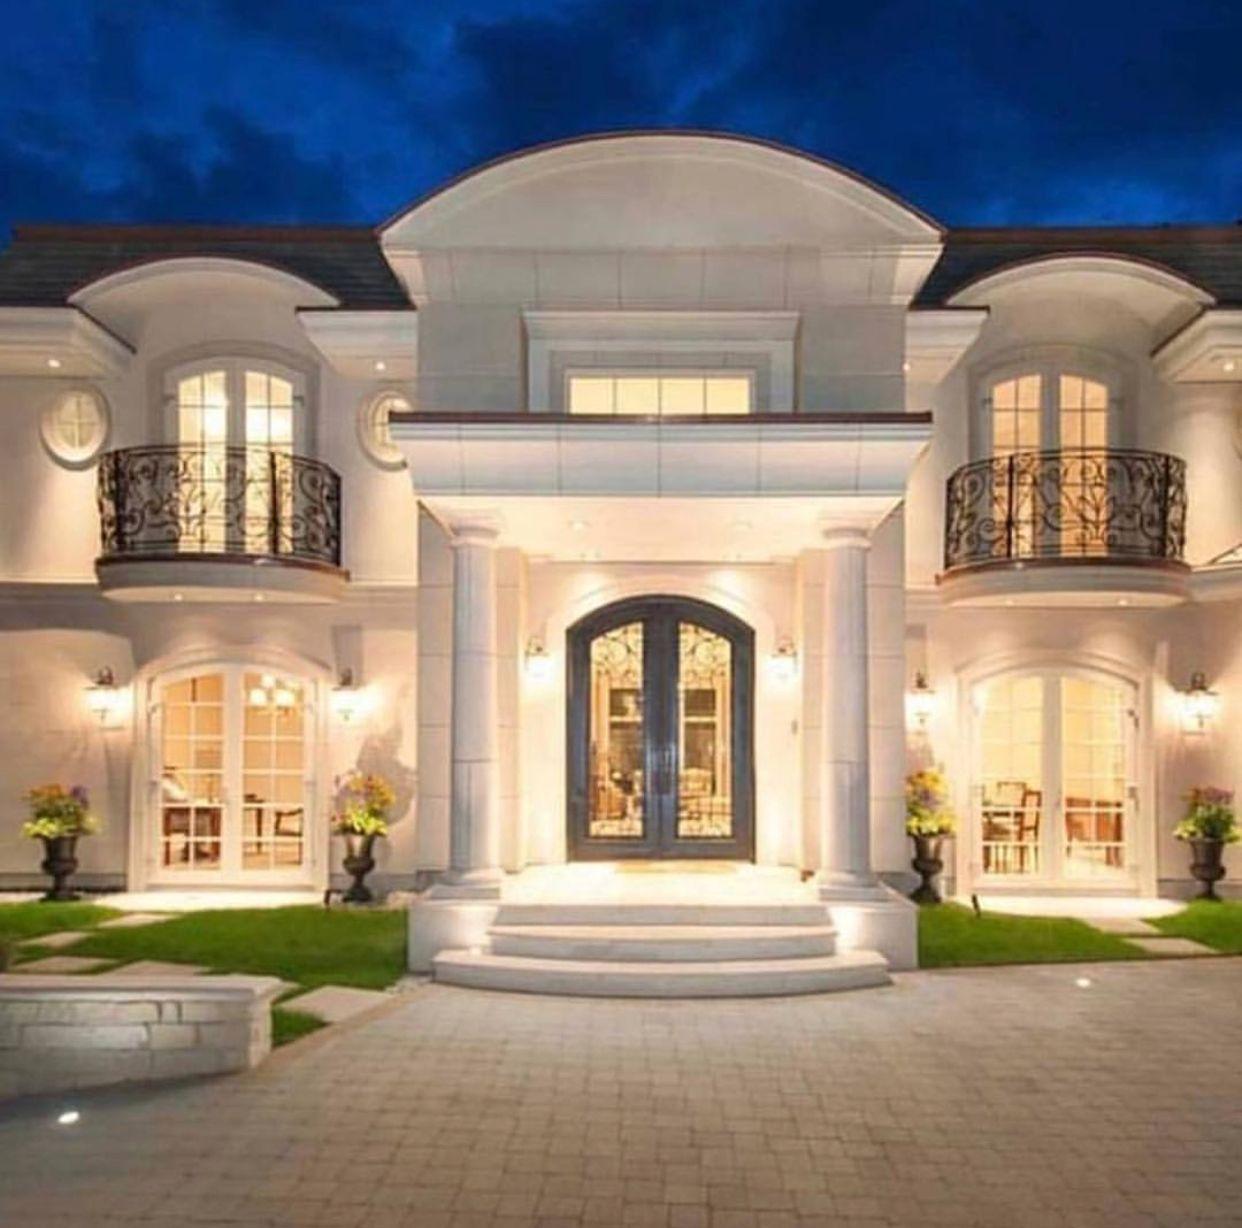 Contemporary Mediterranean House A Private Paradise: An Opulent Mediterranean Mansion In Lewisville TX Elegant